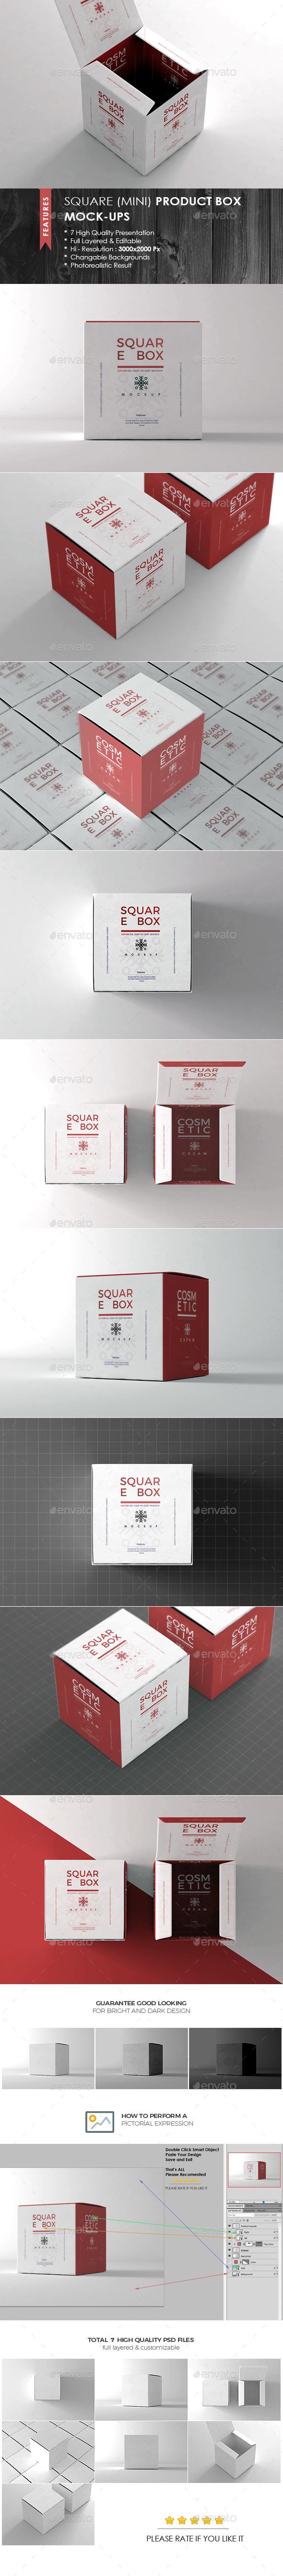 Square Box Mock-up